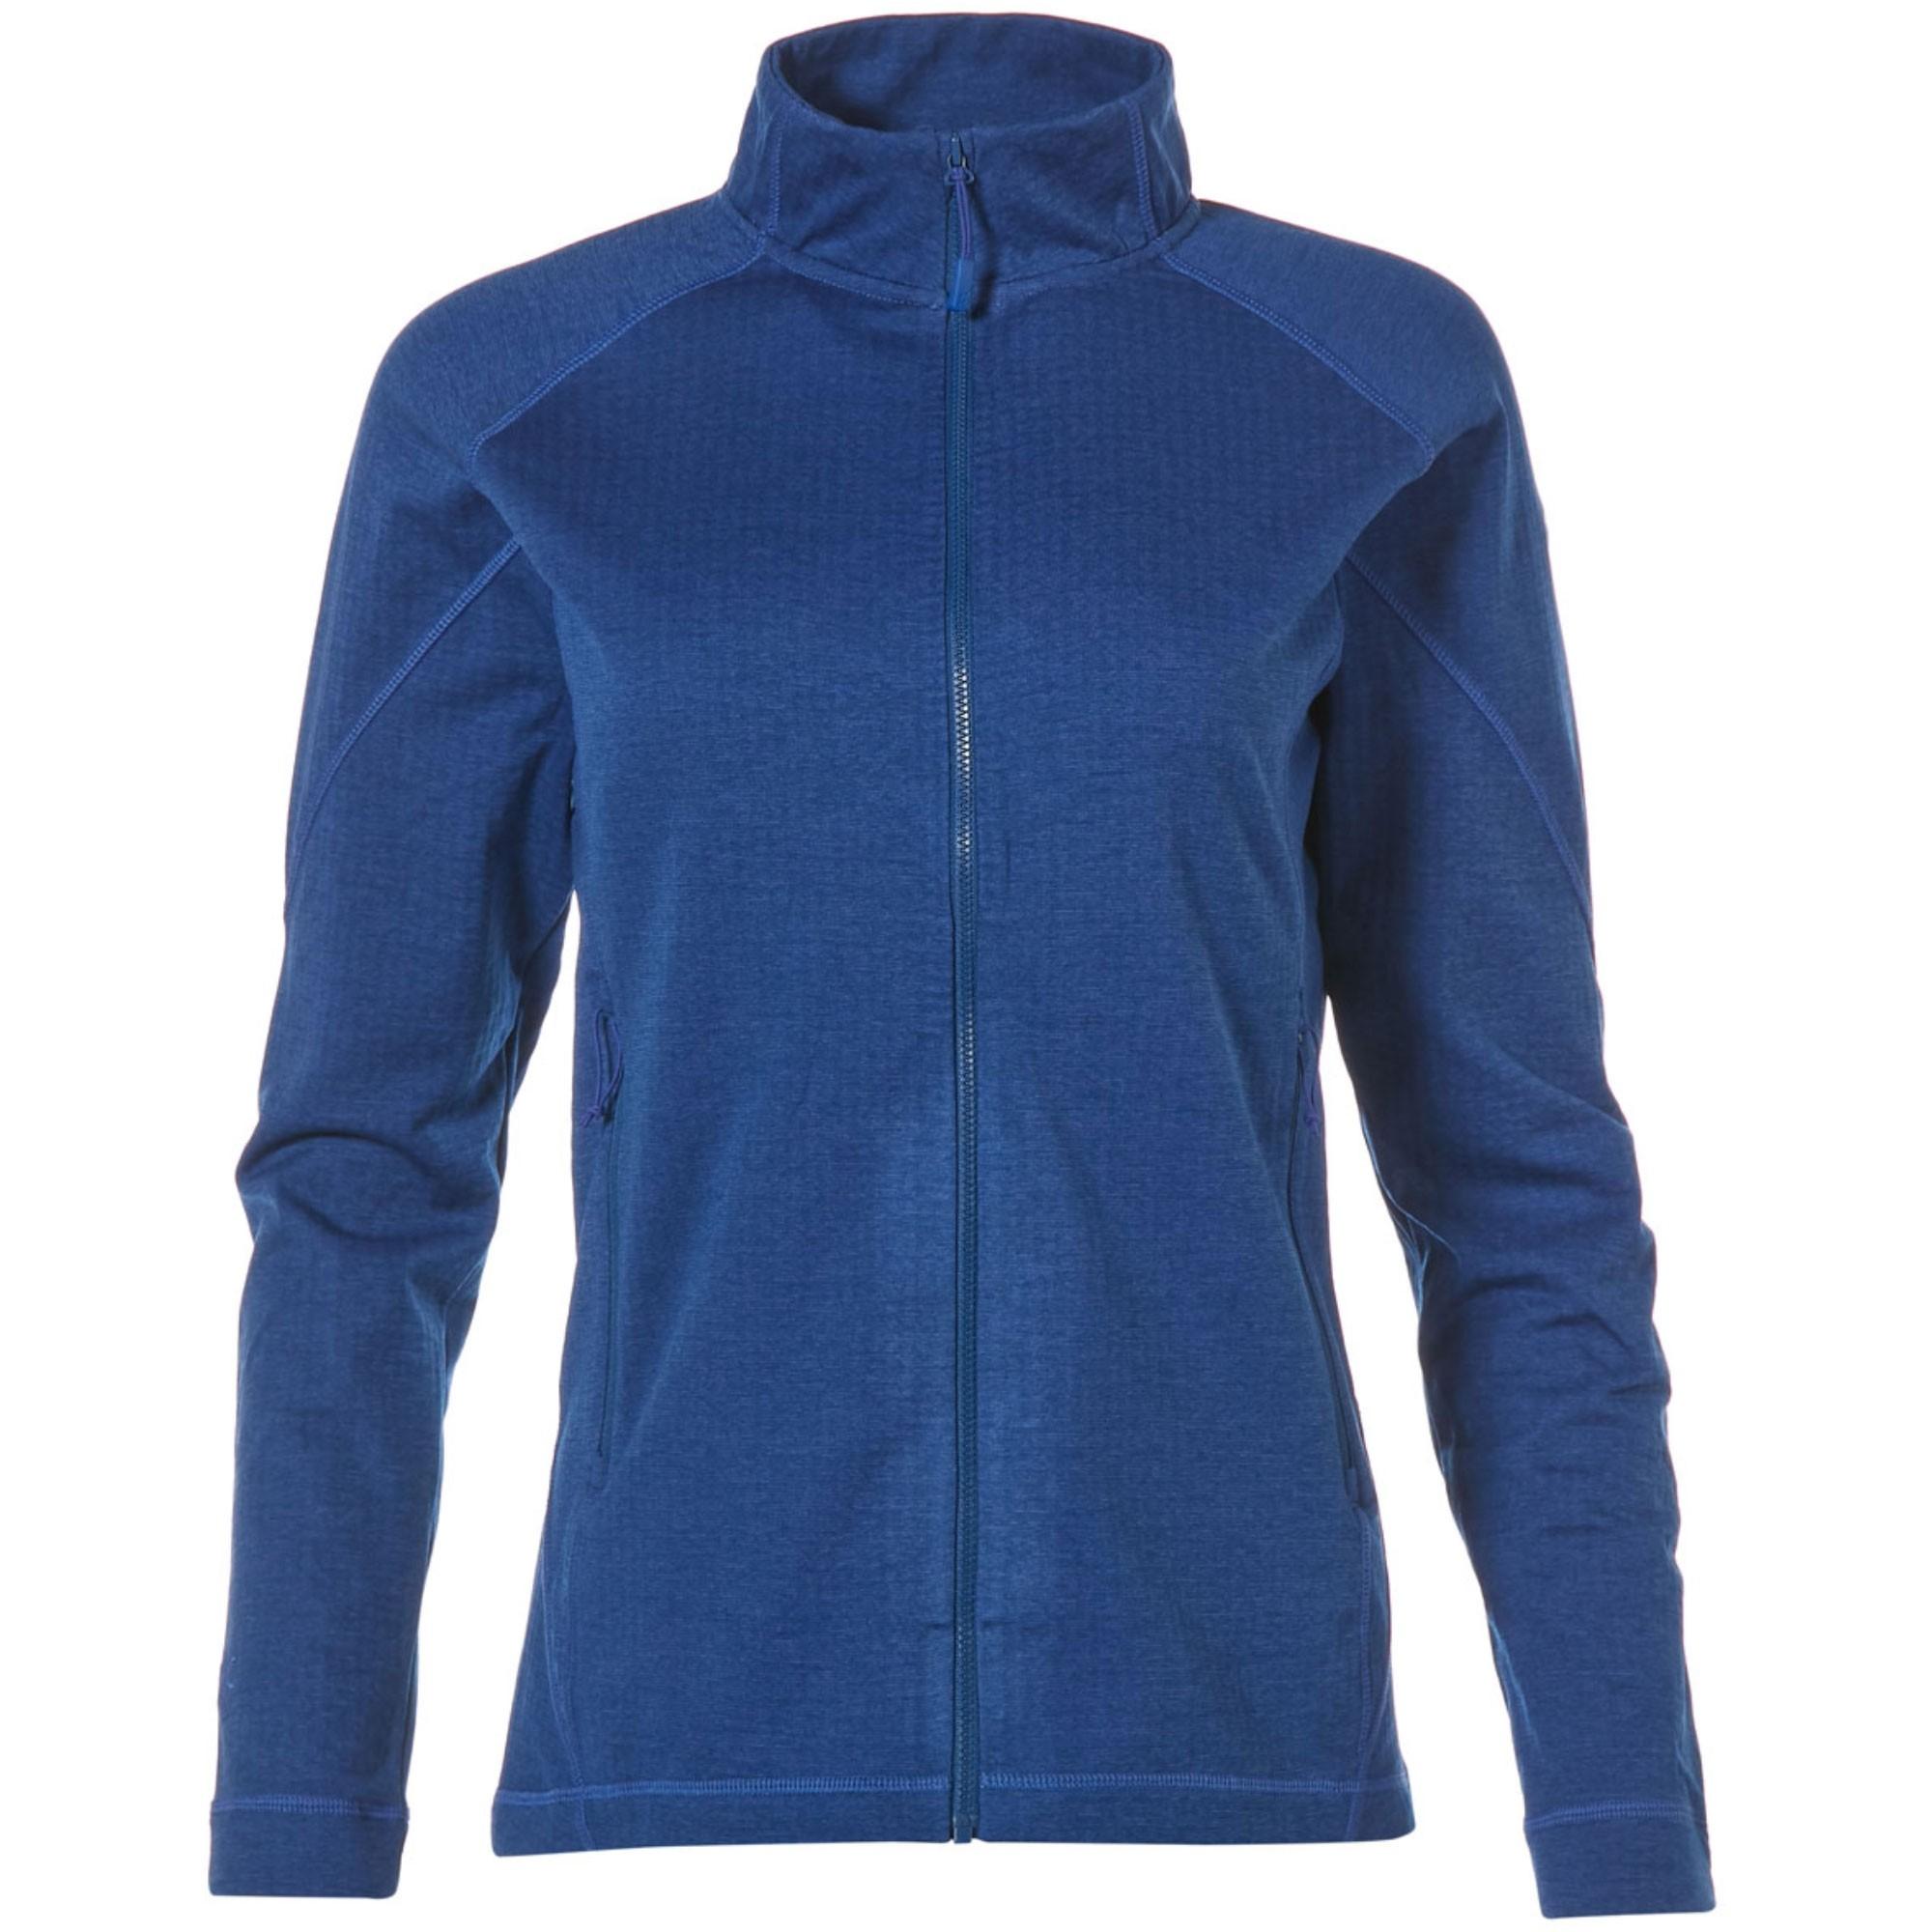 Rab Women's Nucleus Jacket - Blueprint